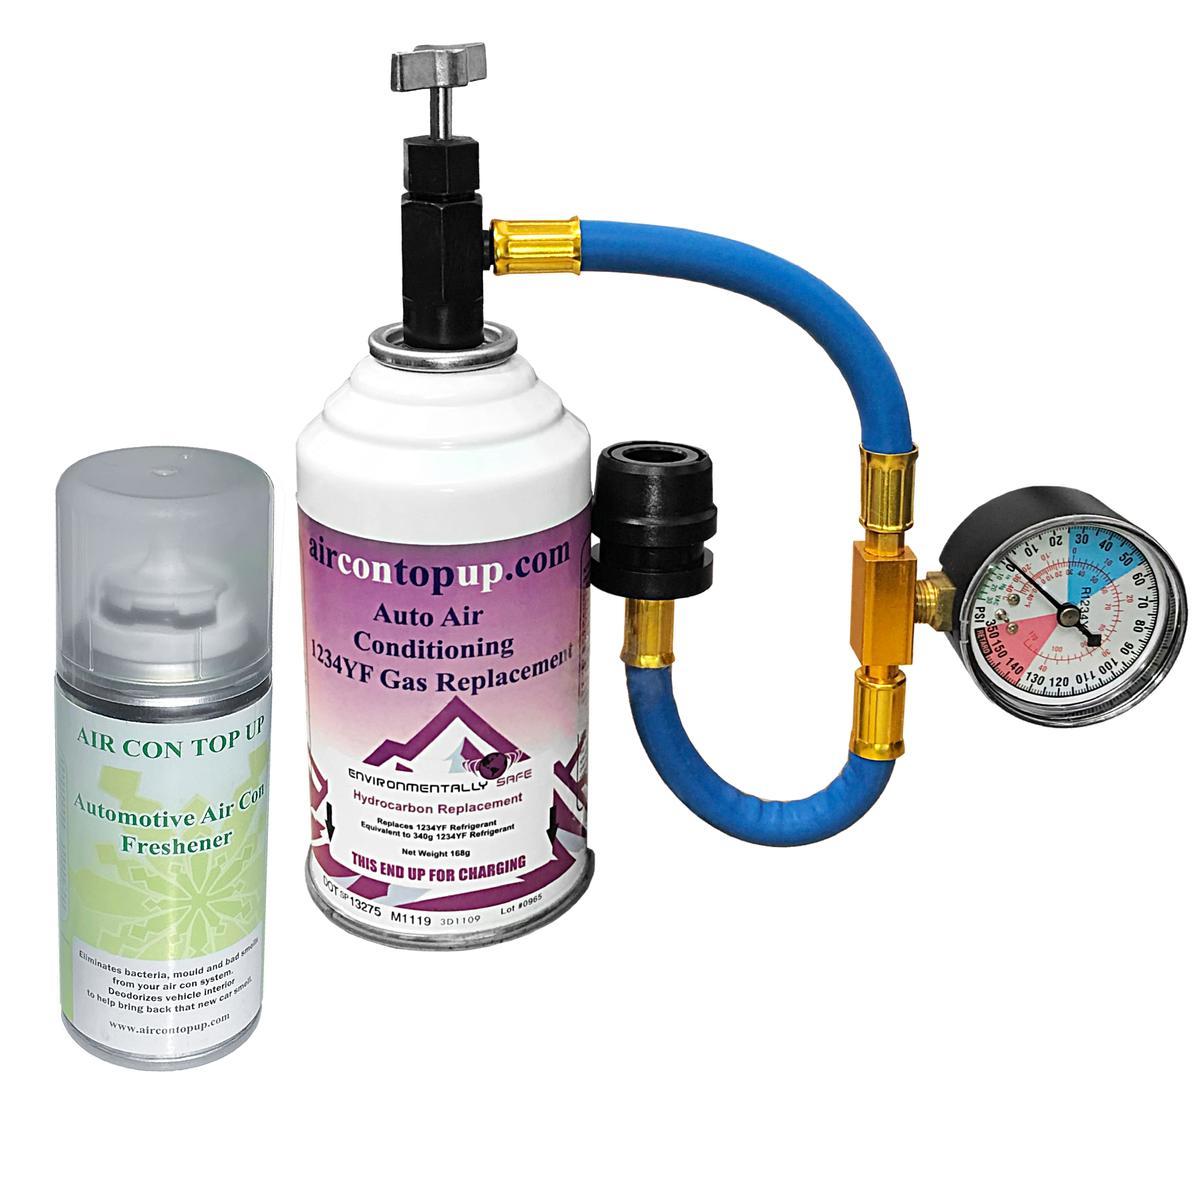 Car AC Aircon R1234YF Air Con Conditioning Top up Regas DIY Gas Kit +Sanitiser